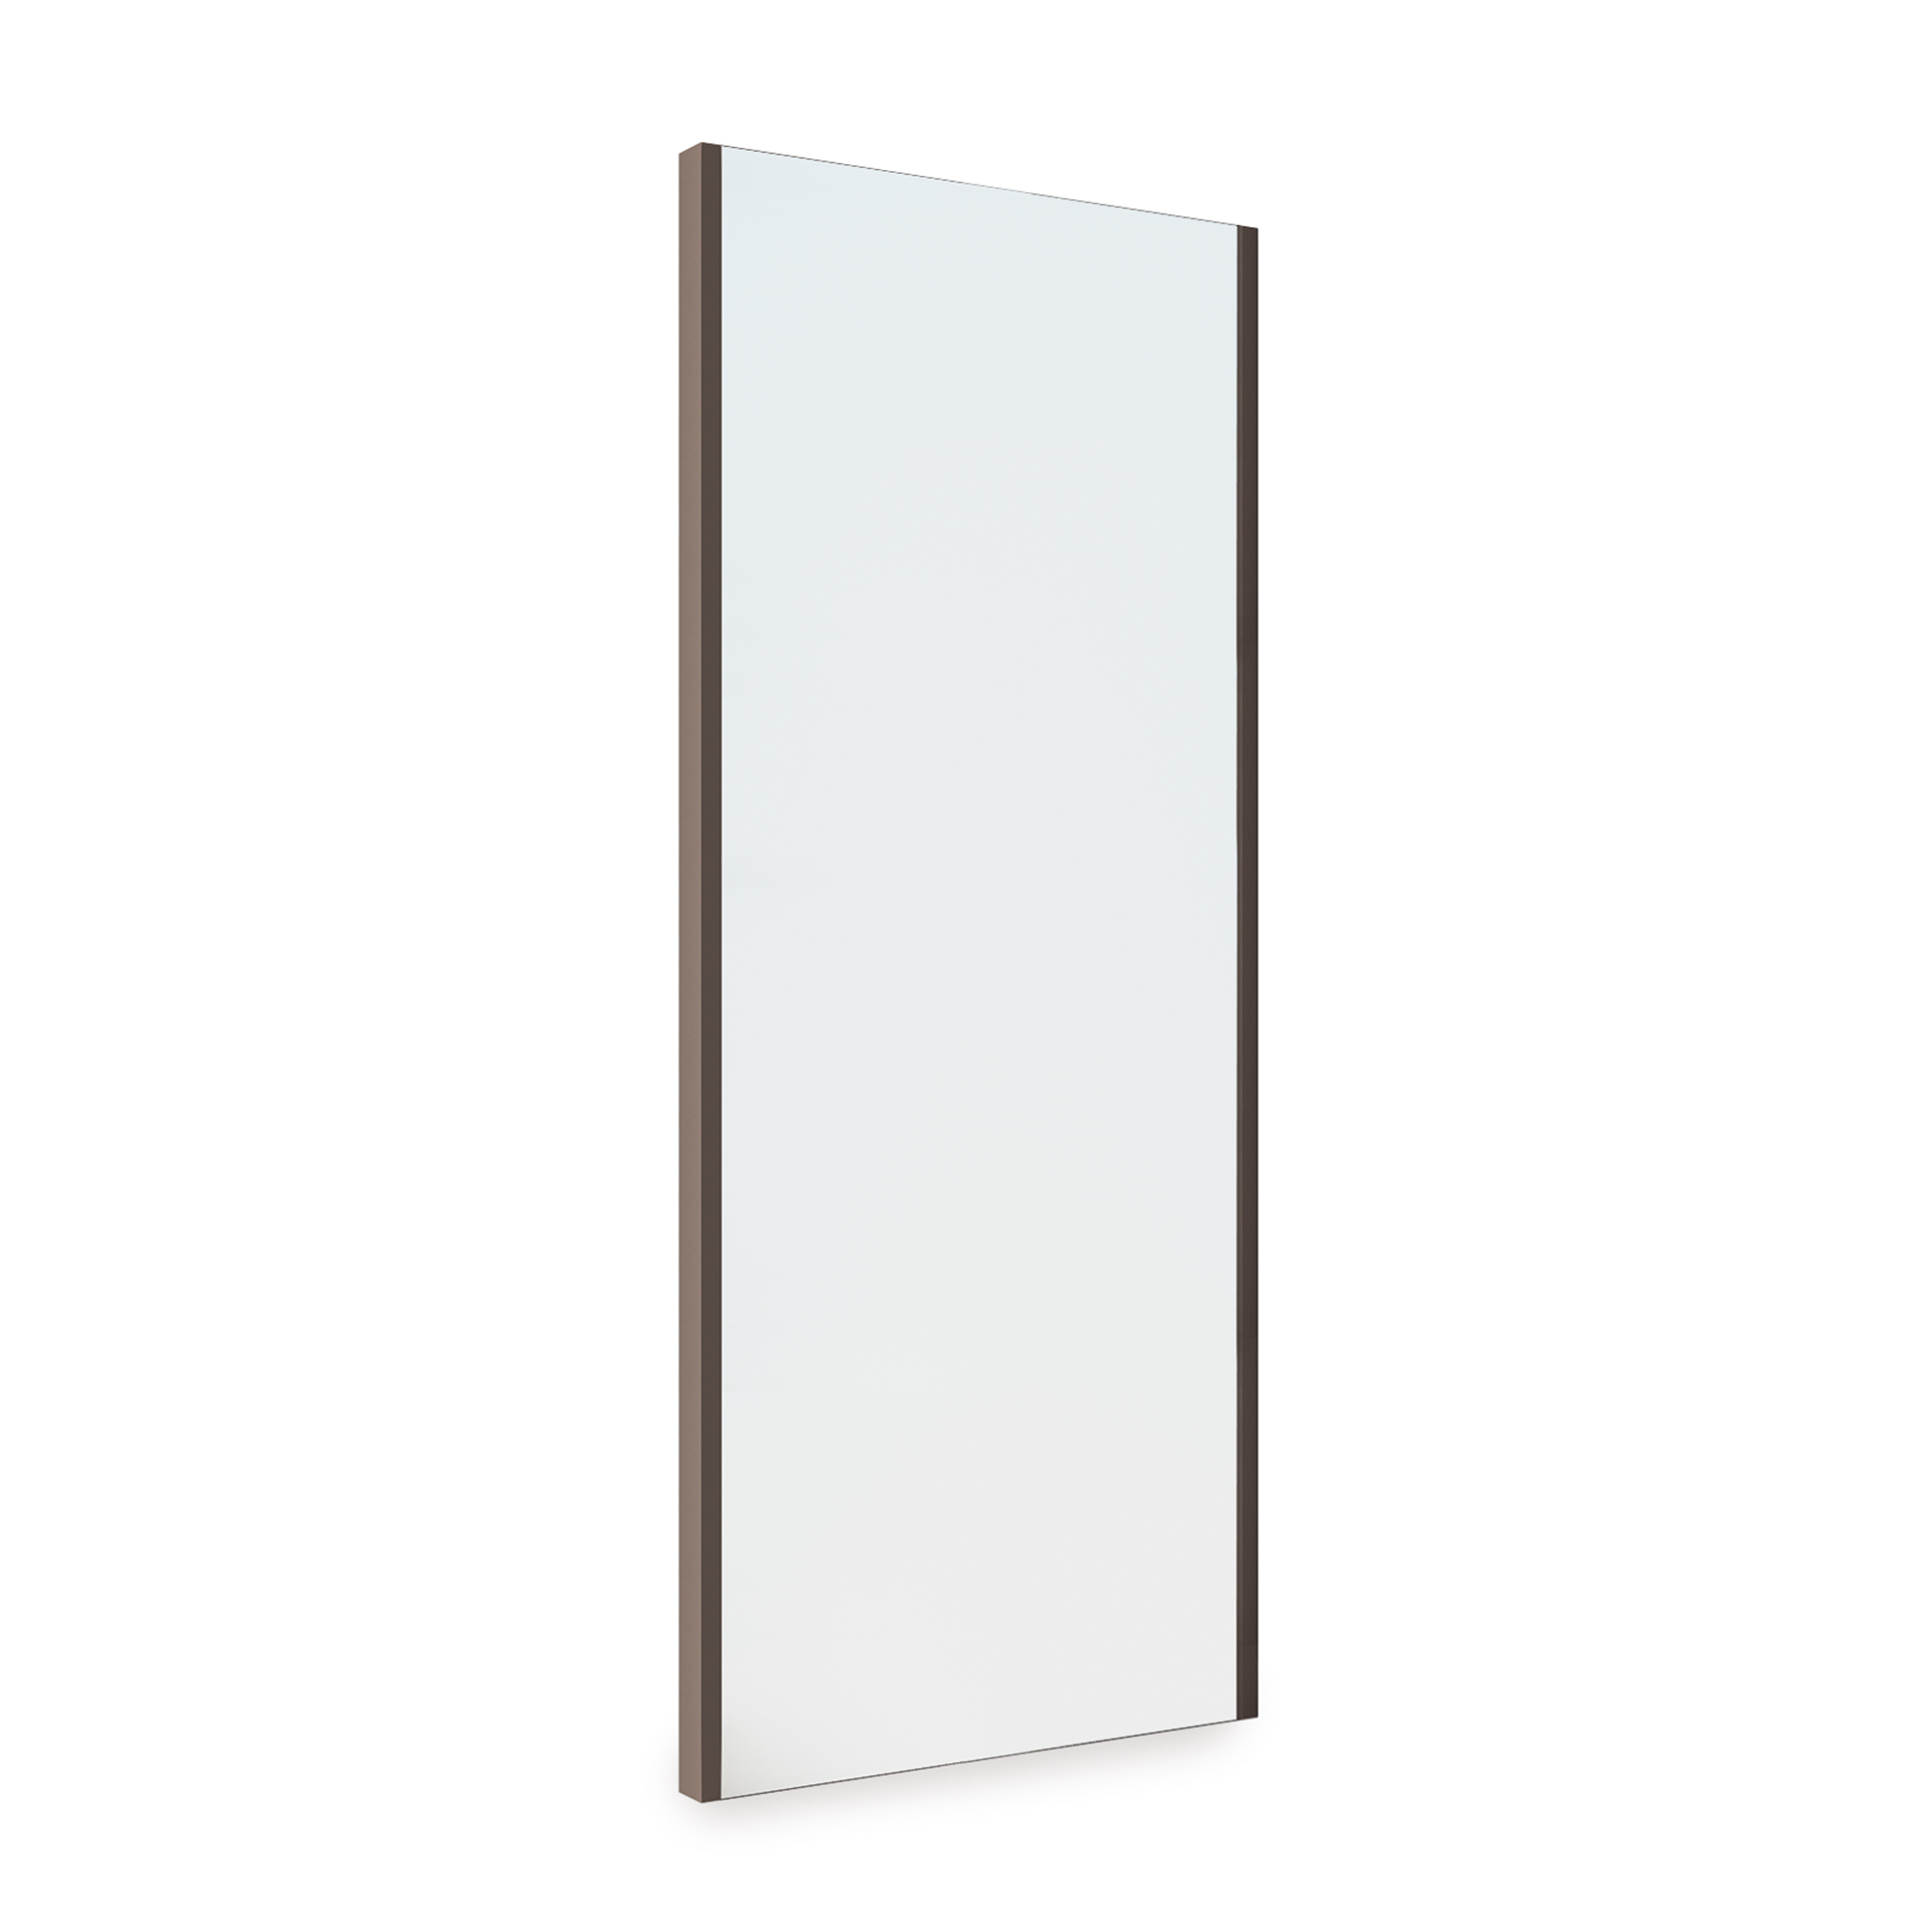 Emuca Specchio estraibile per interni di armadio, regolabile, 340 x 1000 mm, finitura moka.